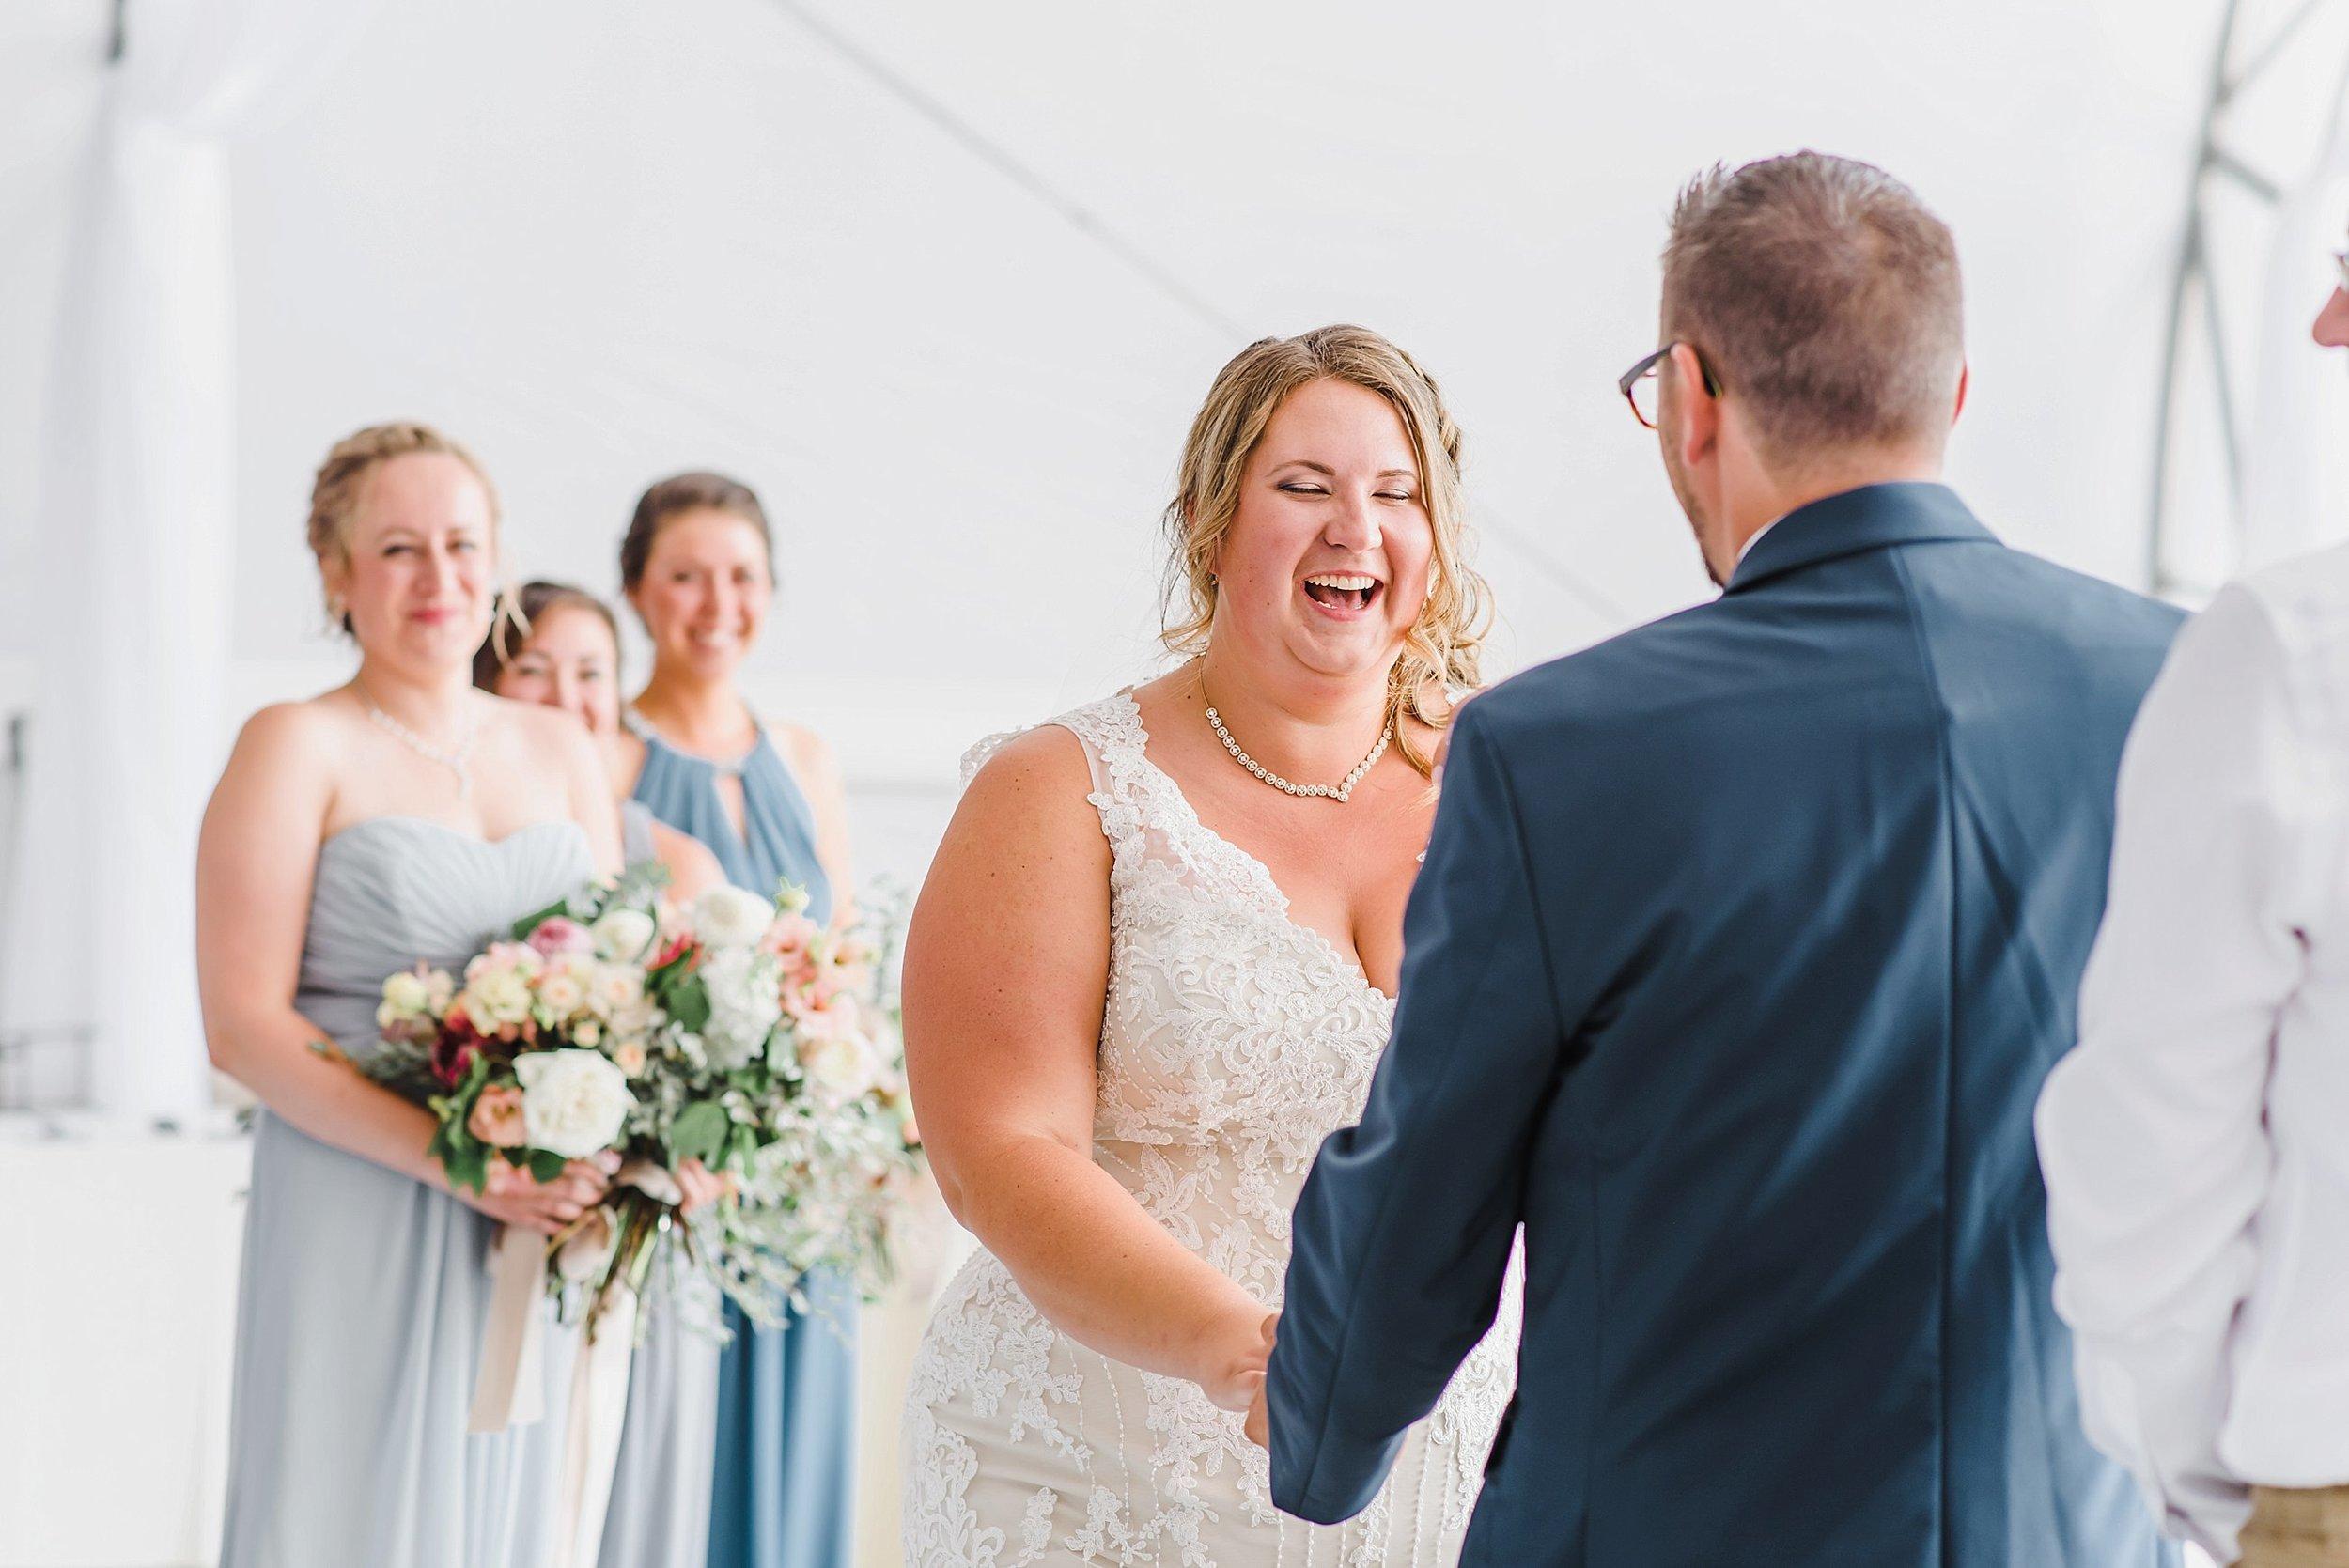 light airy indie fine art ottawa wedding photographer | Ali and Batoul Photography_0370.jpg